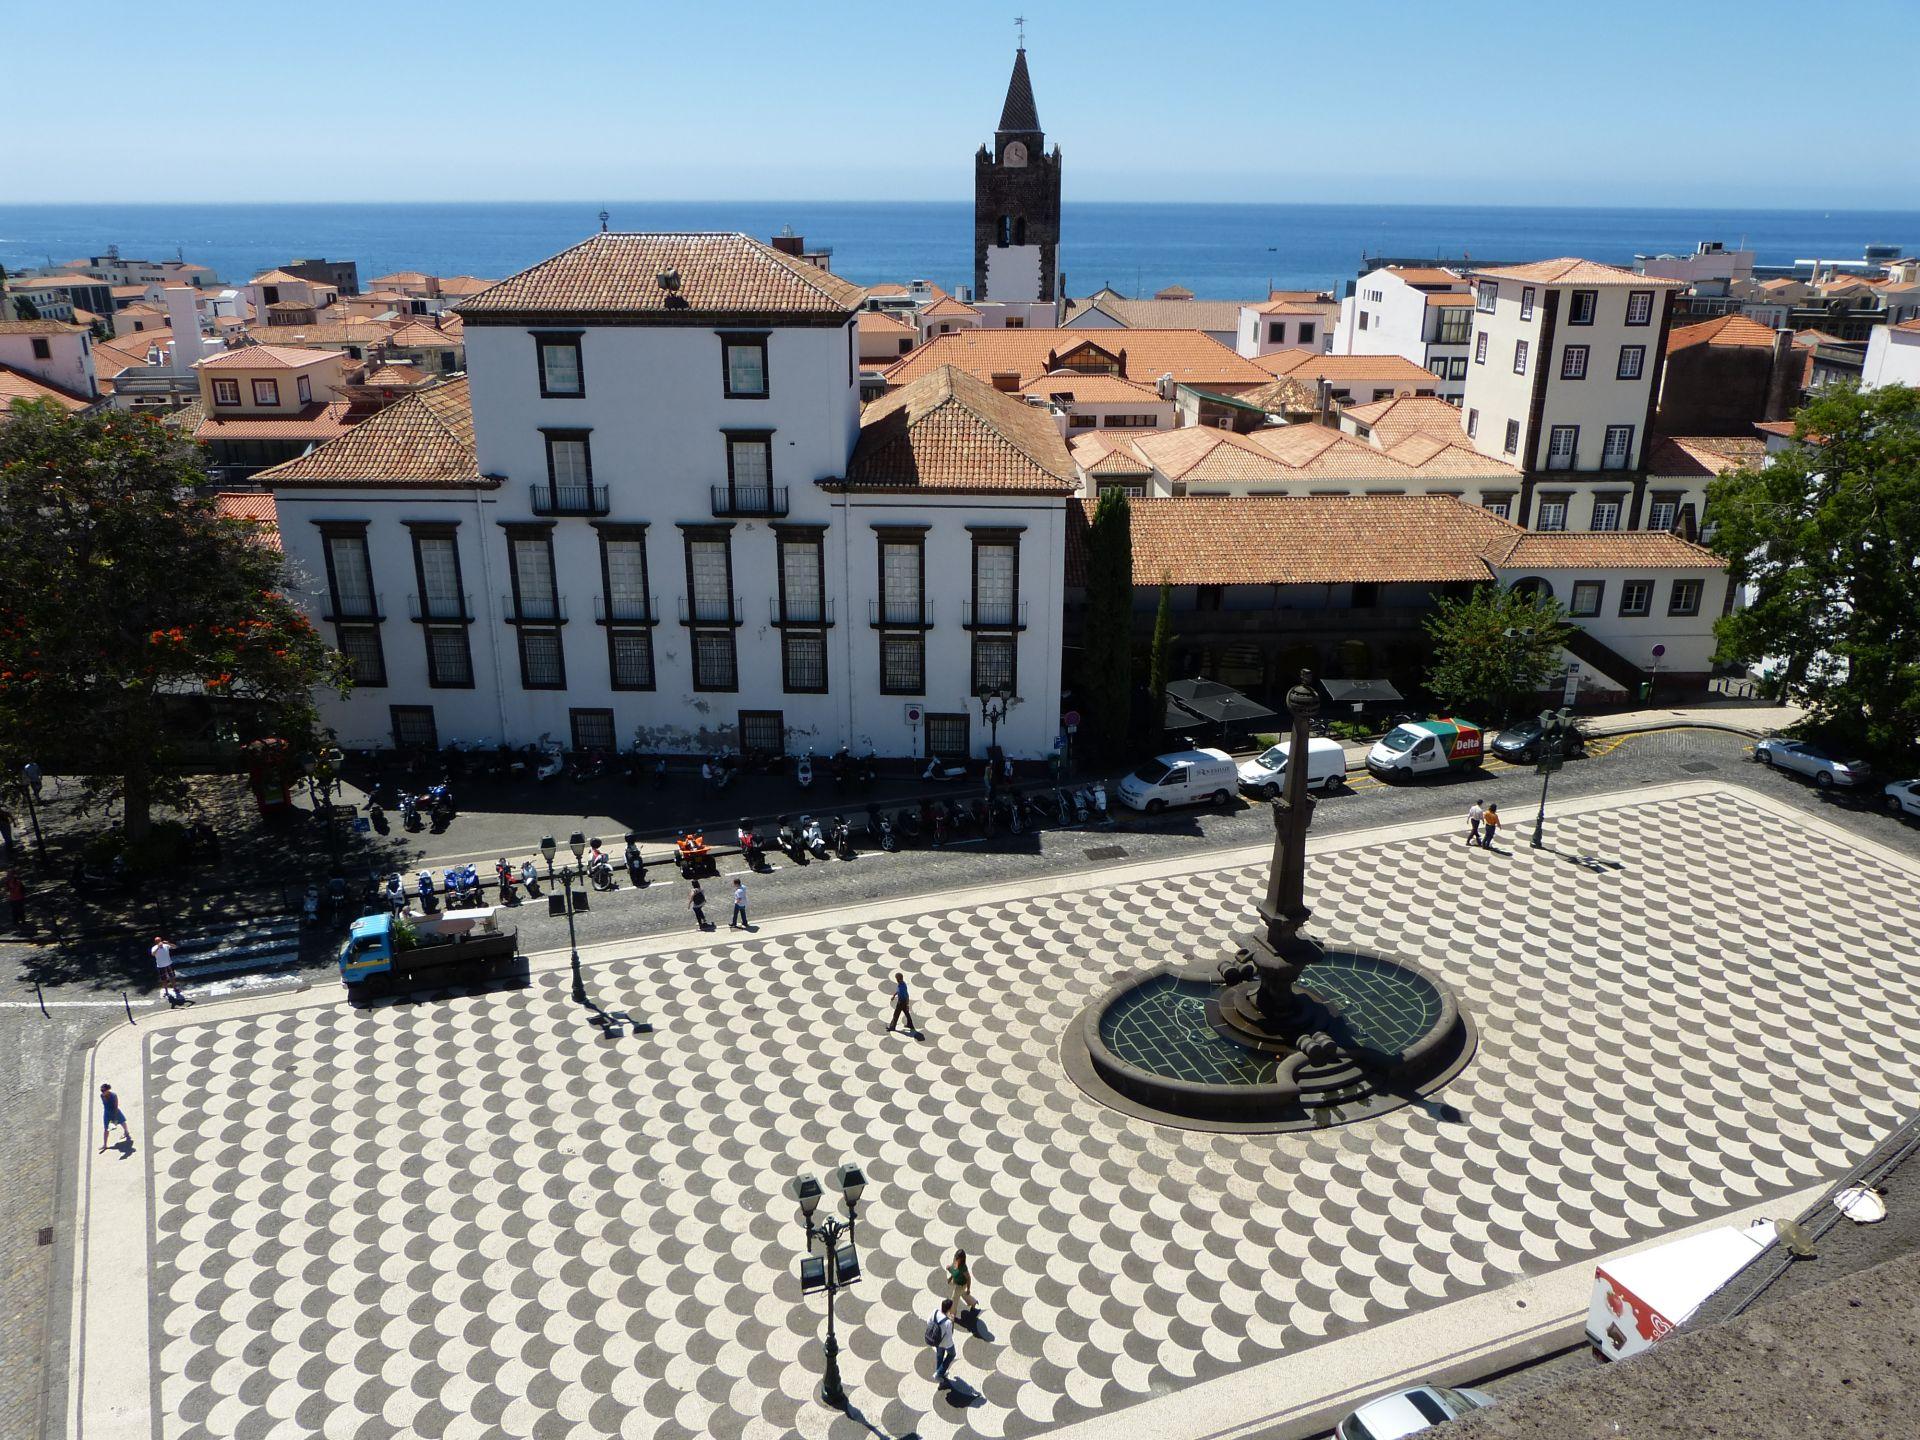 Praça do Município vom Balkon der Igreja do Colégio